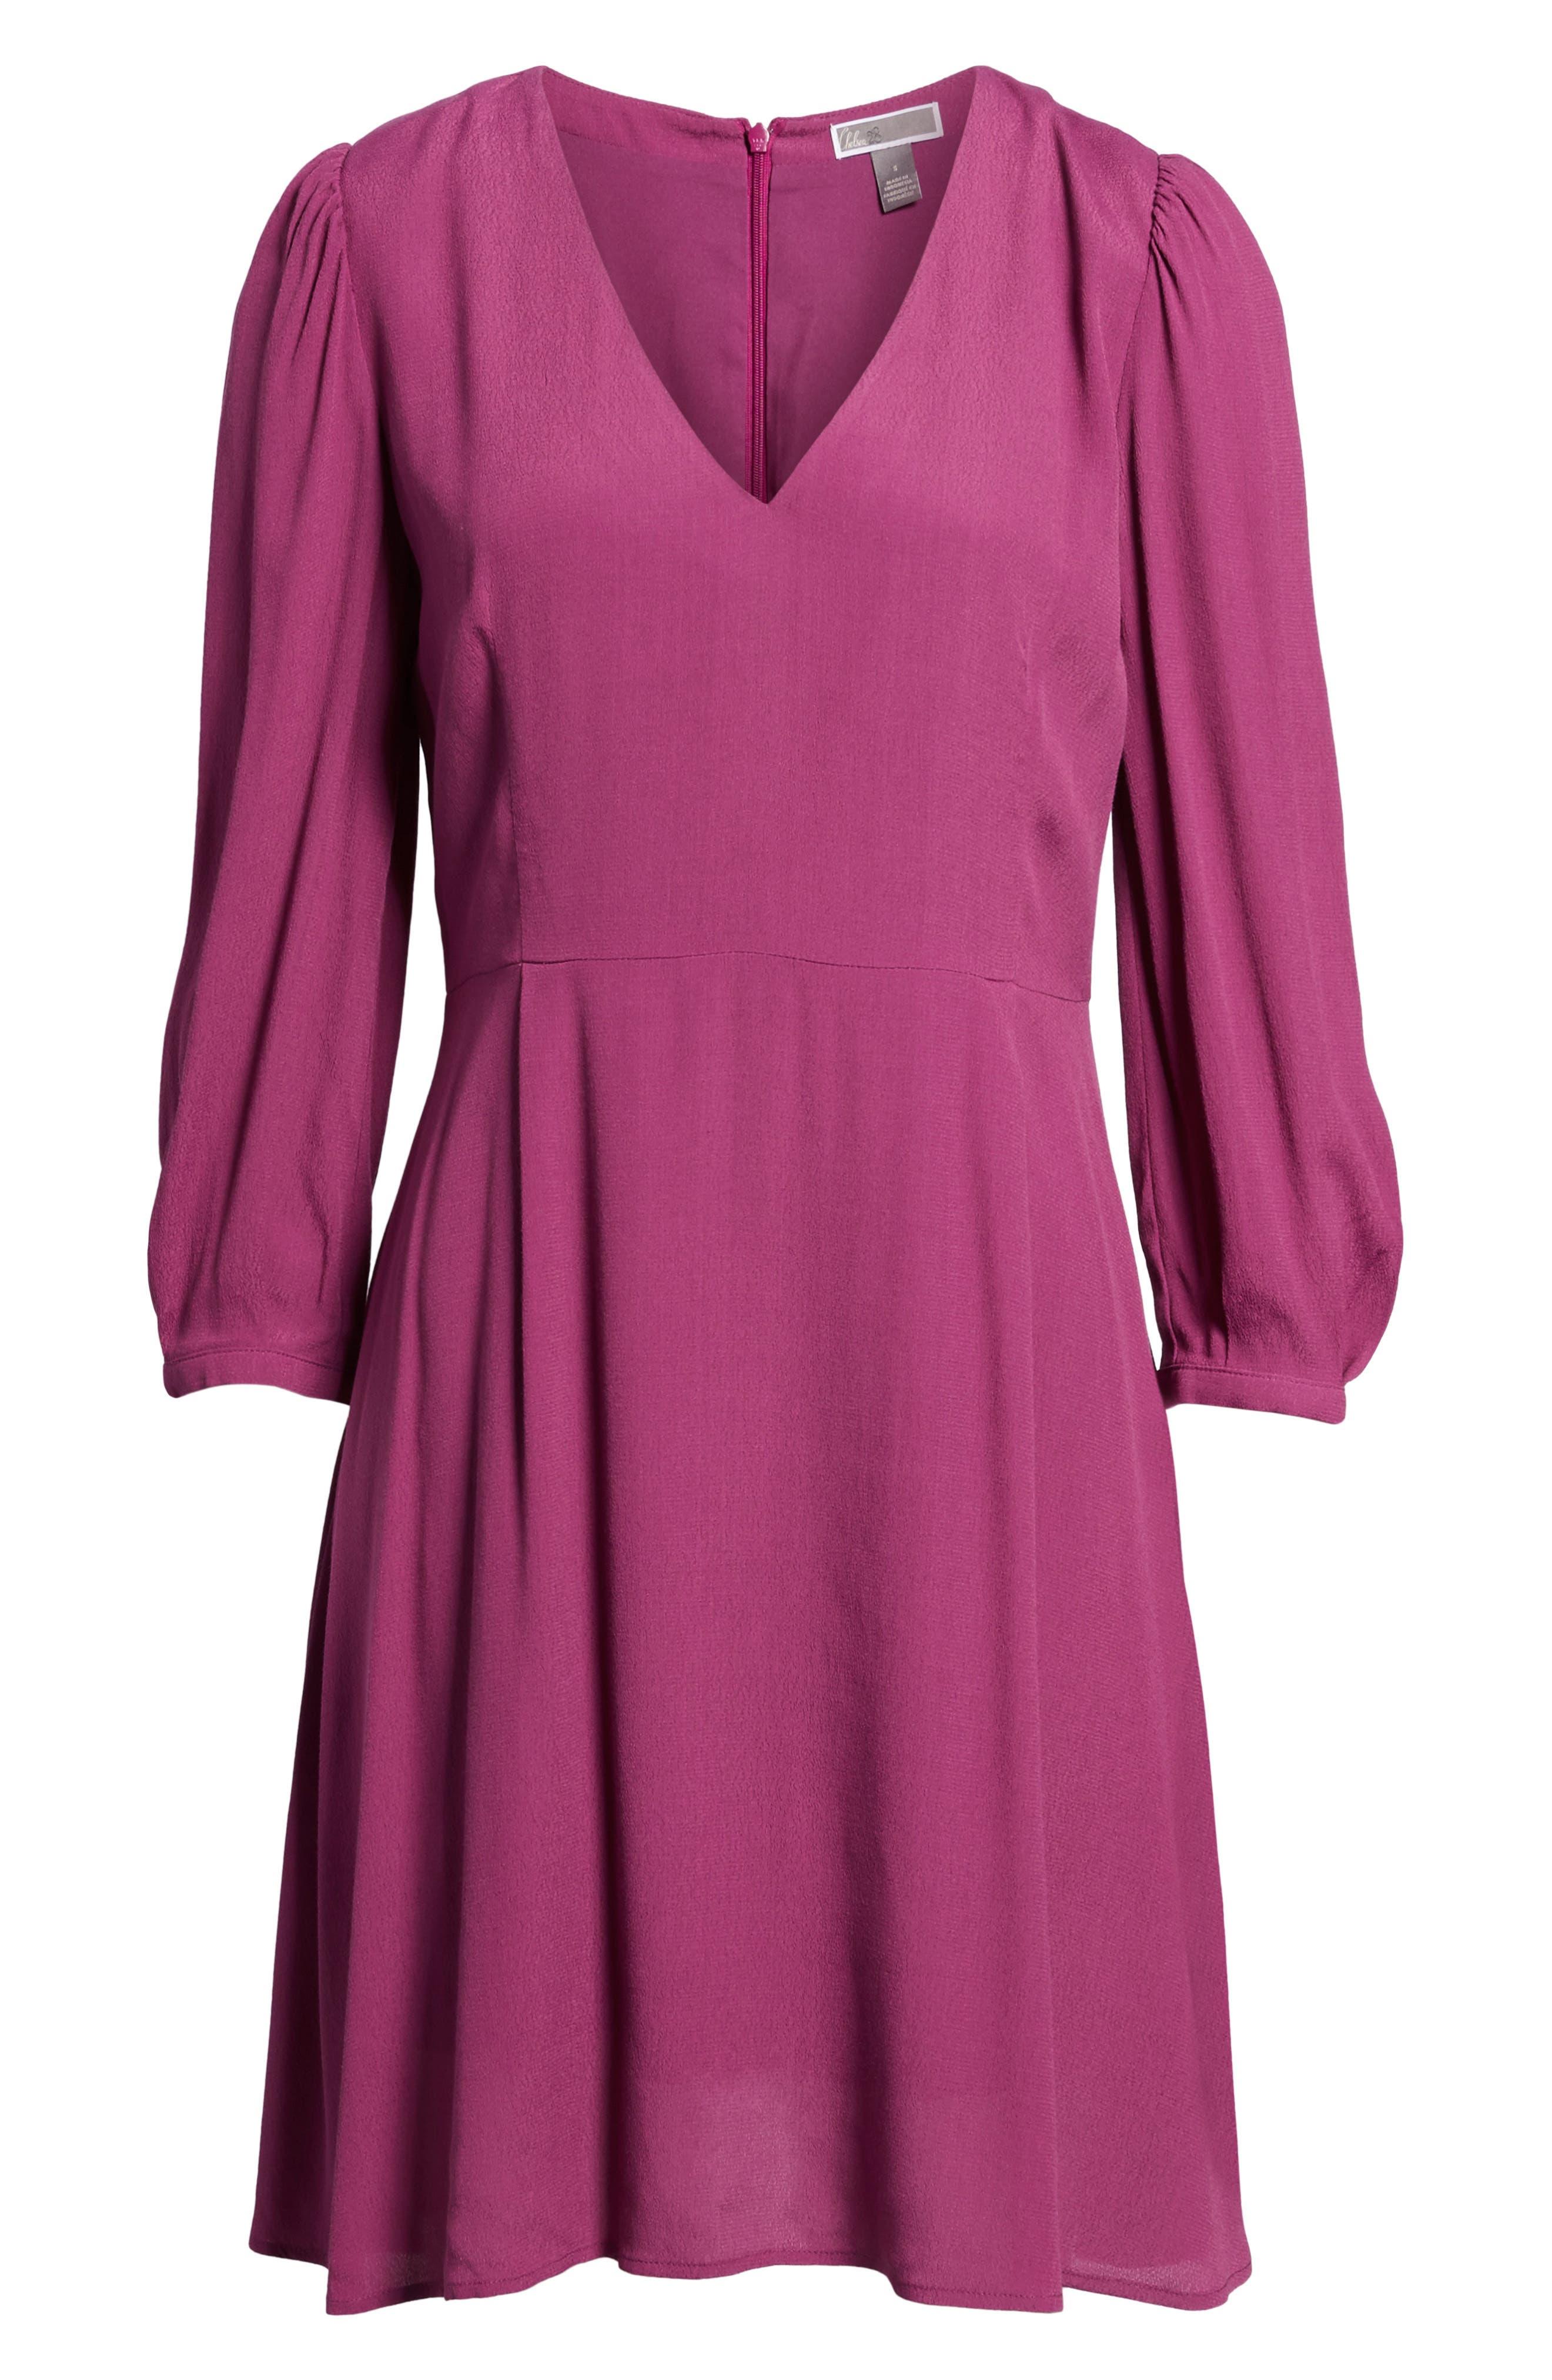 V-Neck Puff Sleeve Dress,                             Alternate thumbnail 7, color,                             510